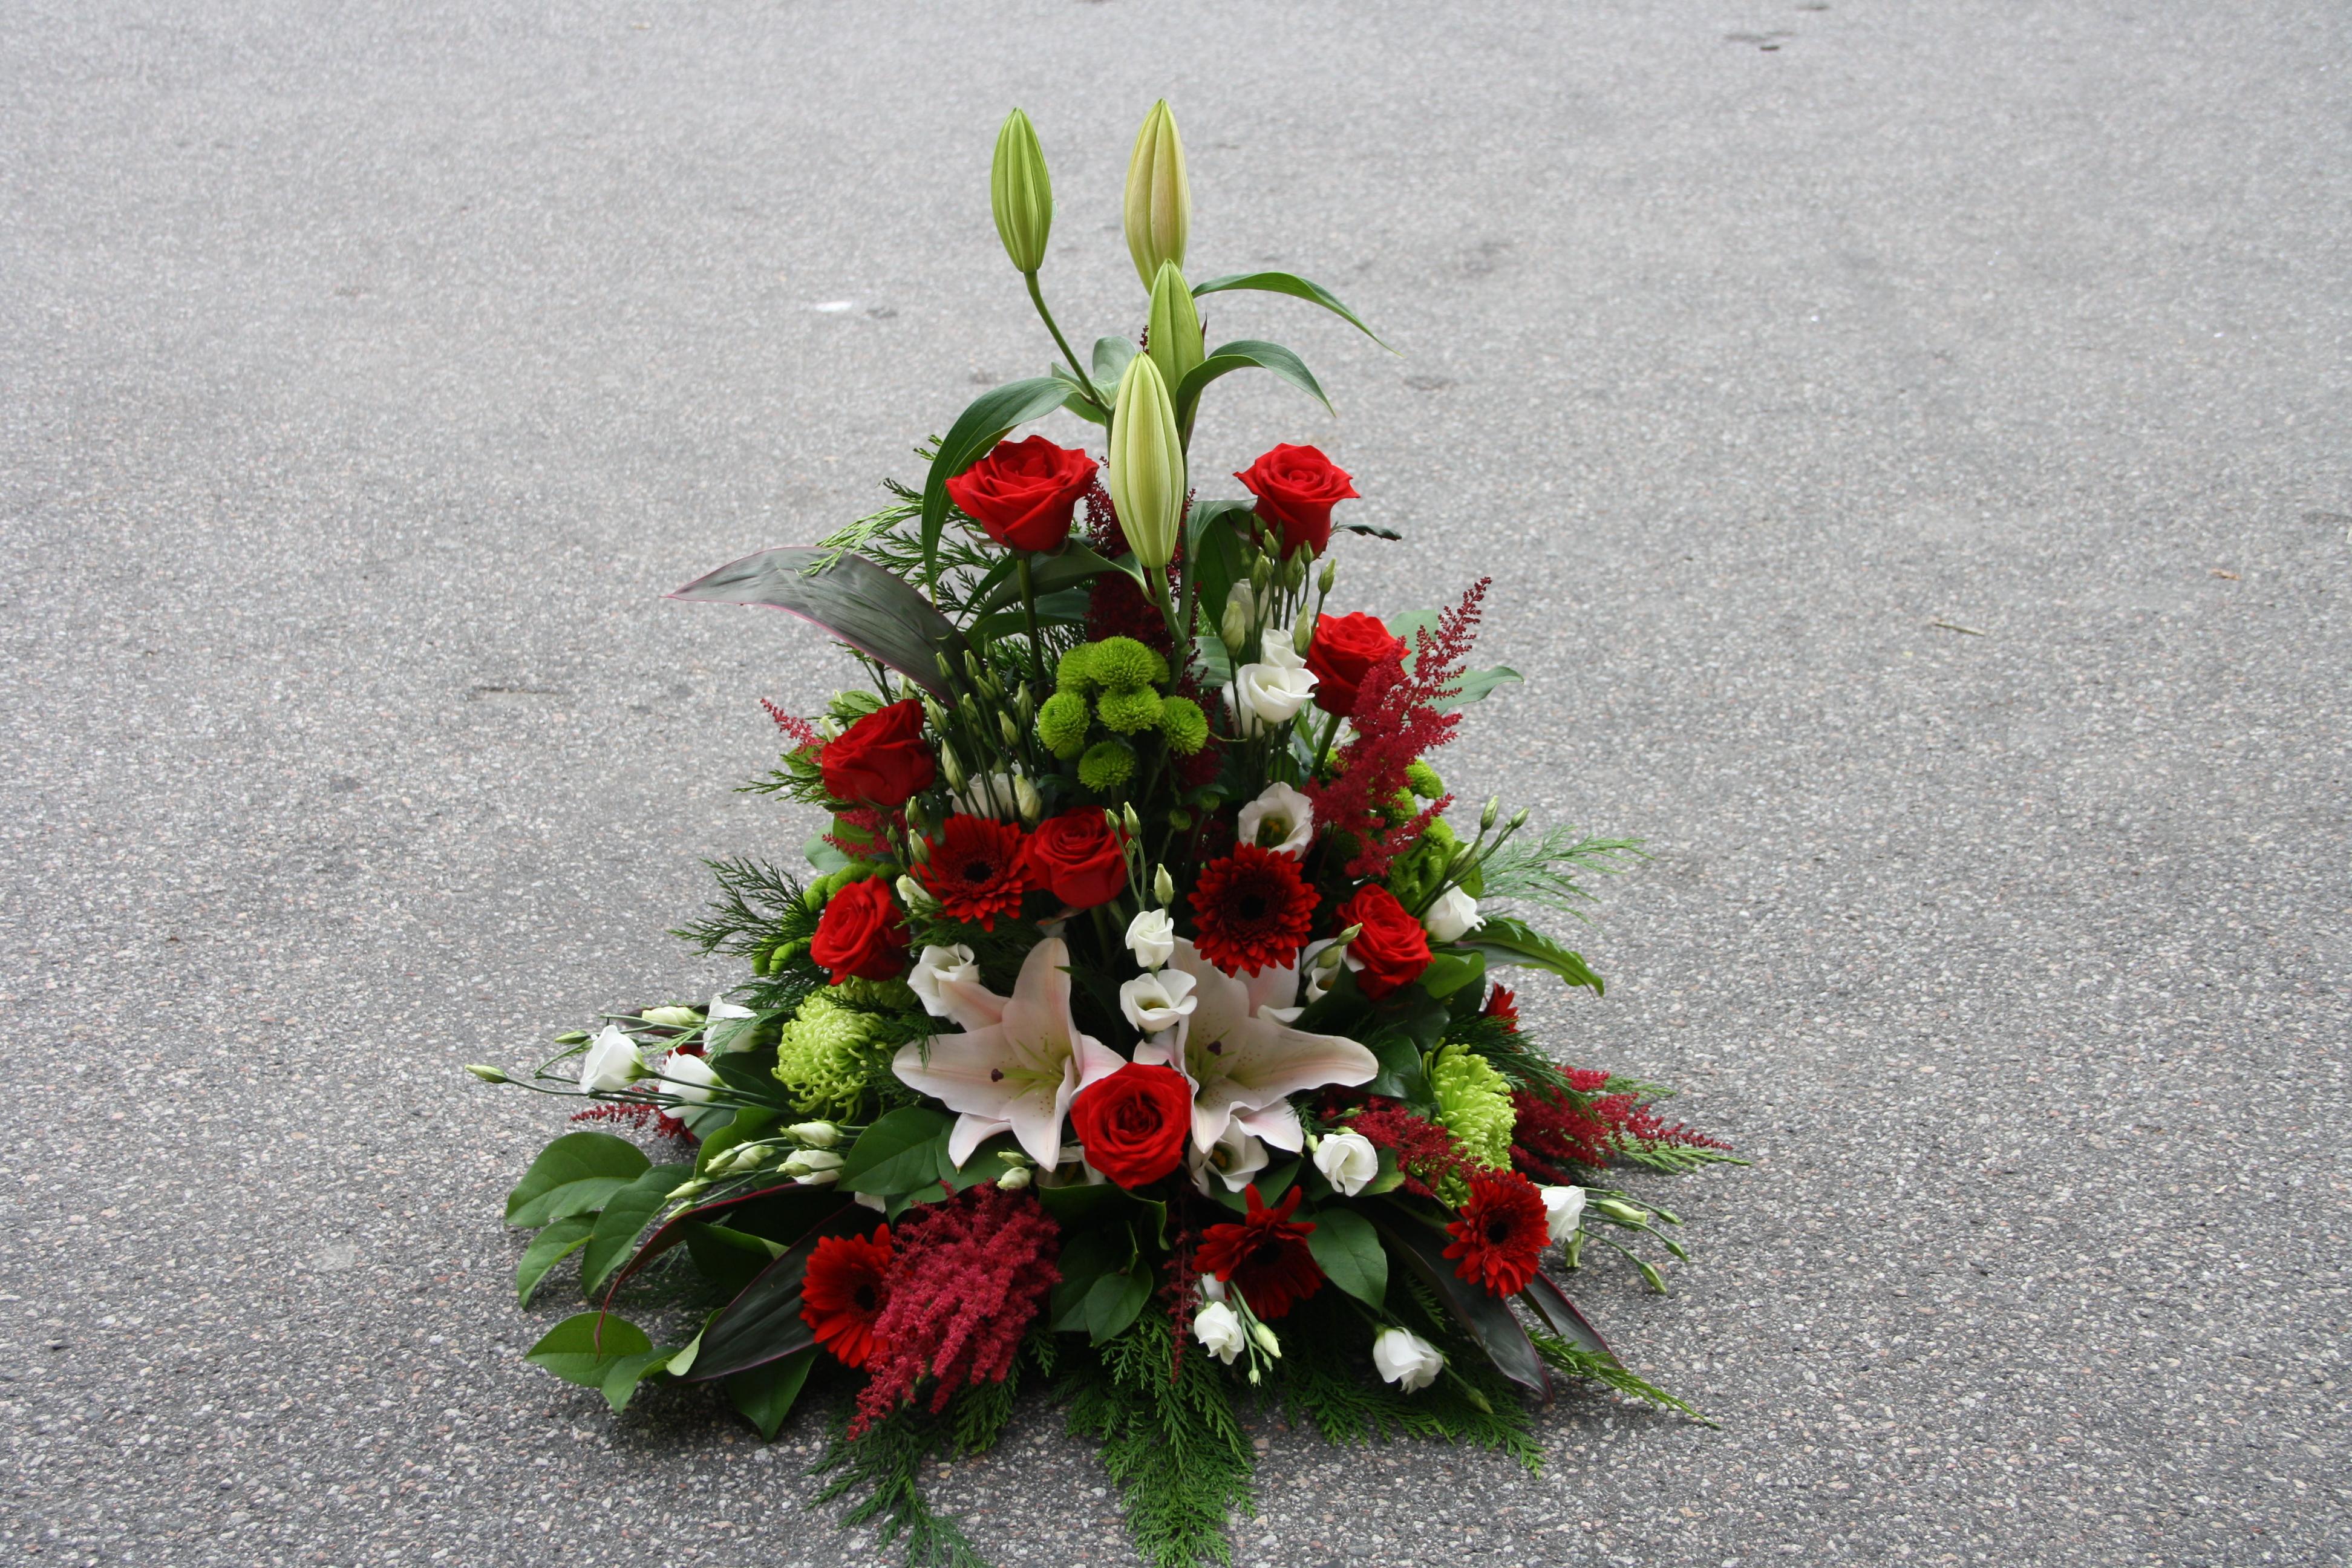 Begravning8